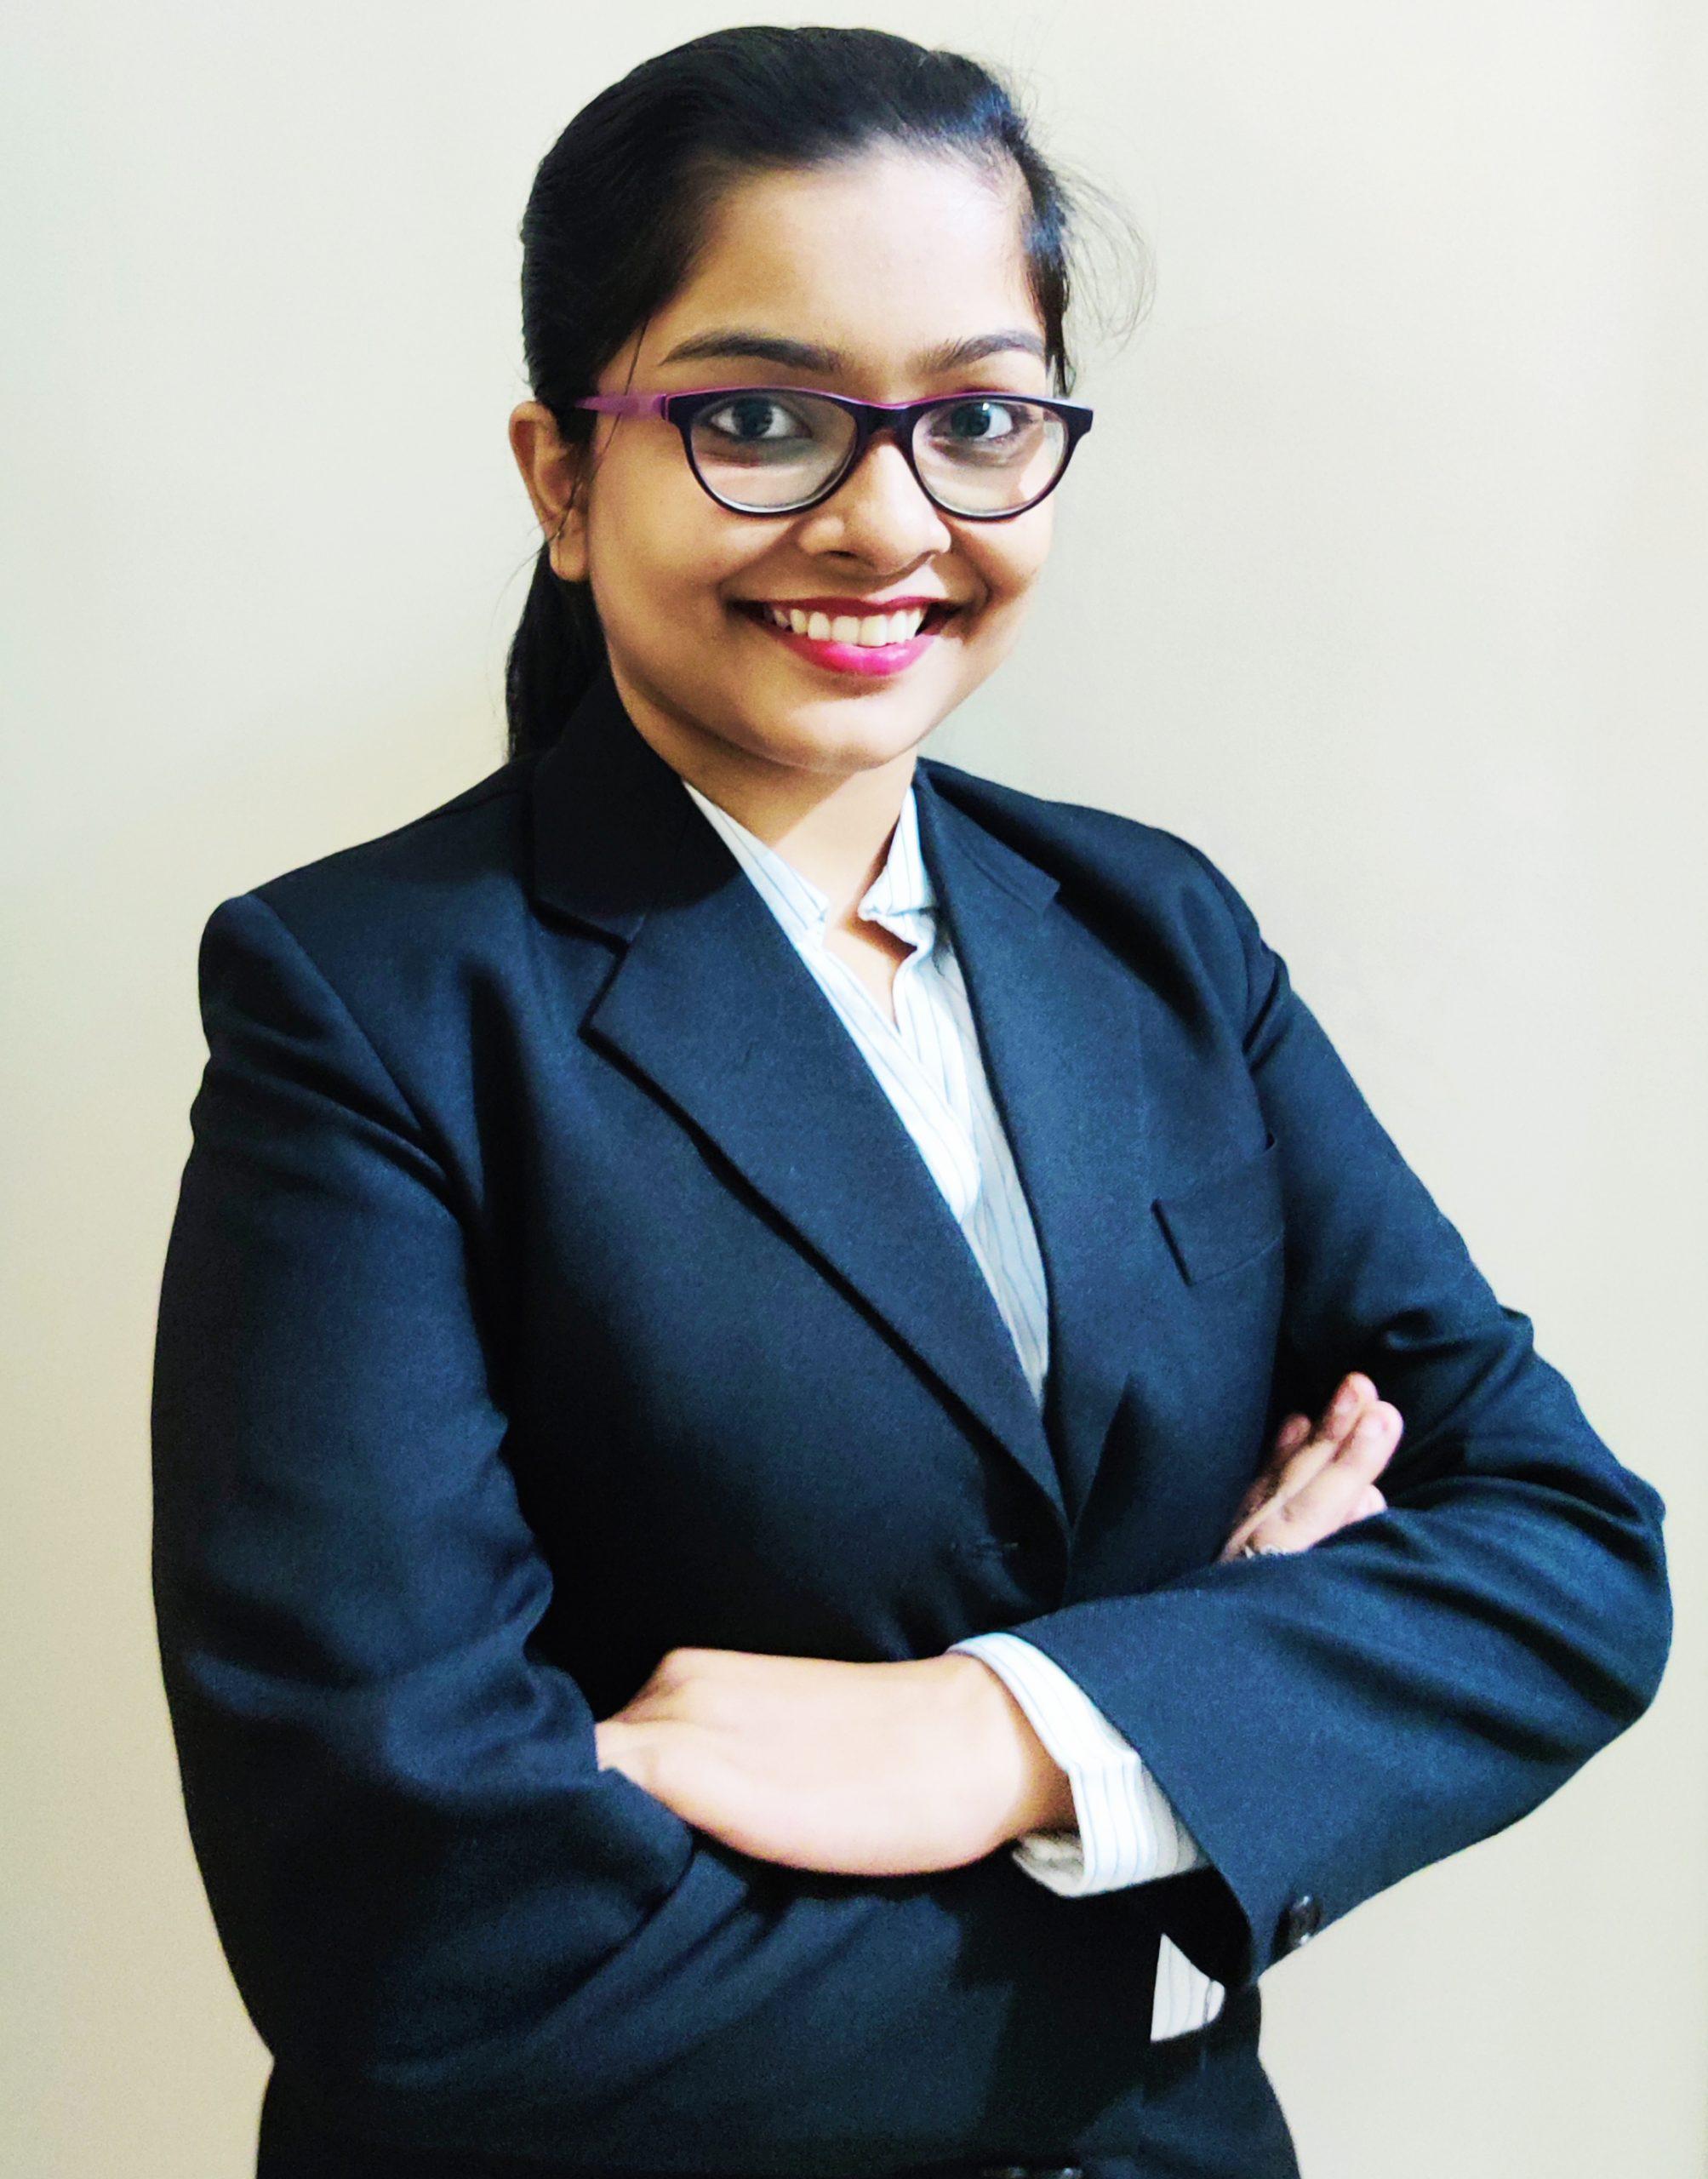 Sannidhi Mahapatra